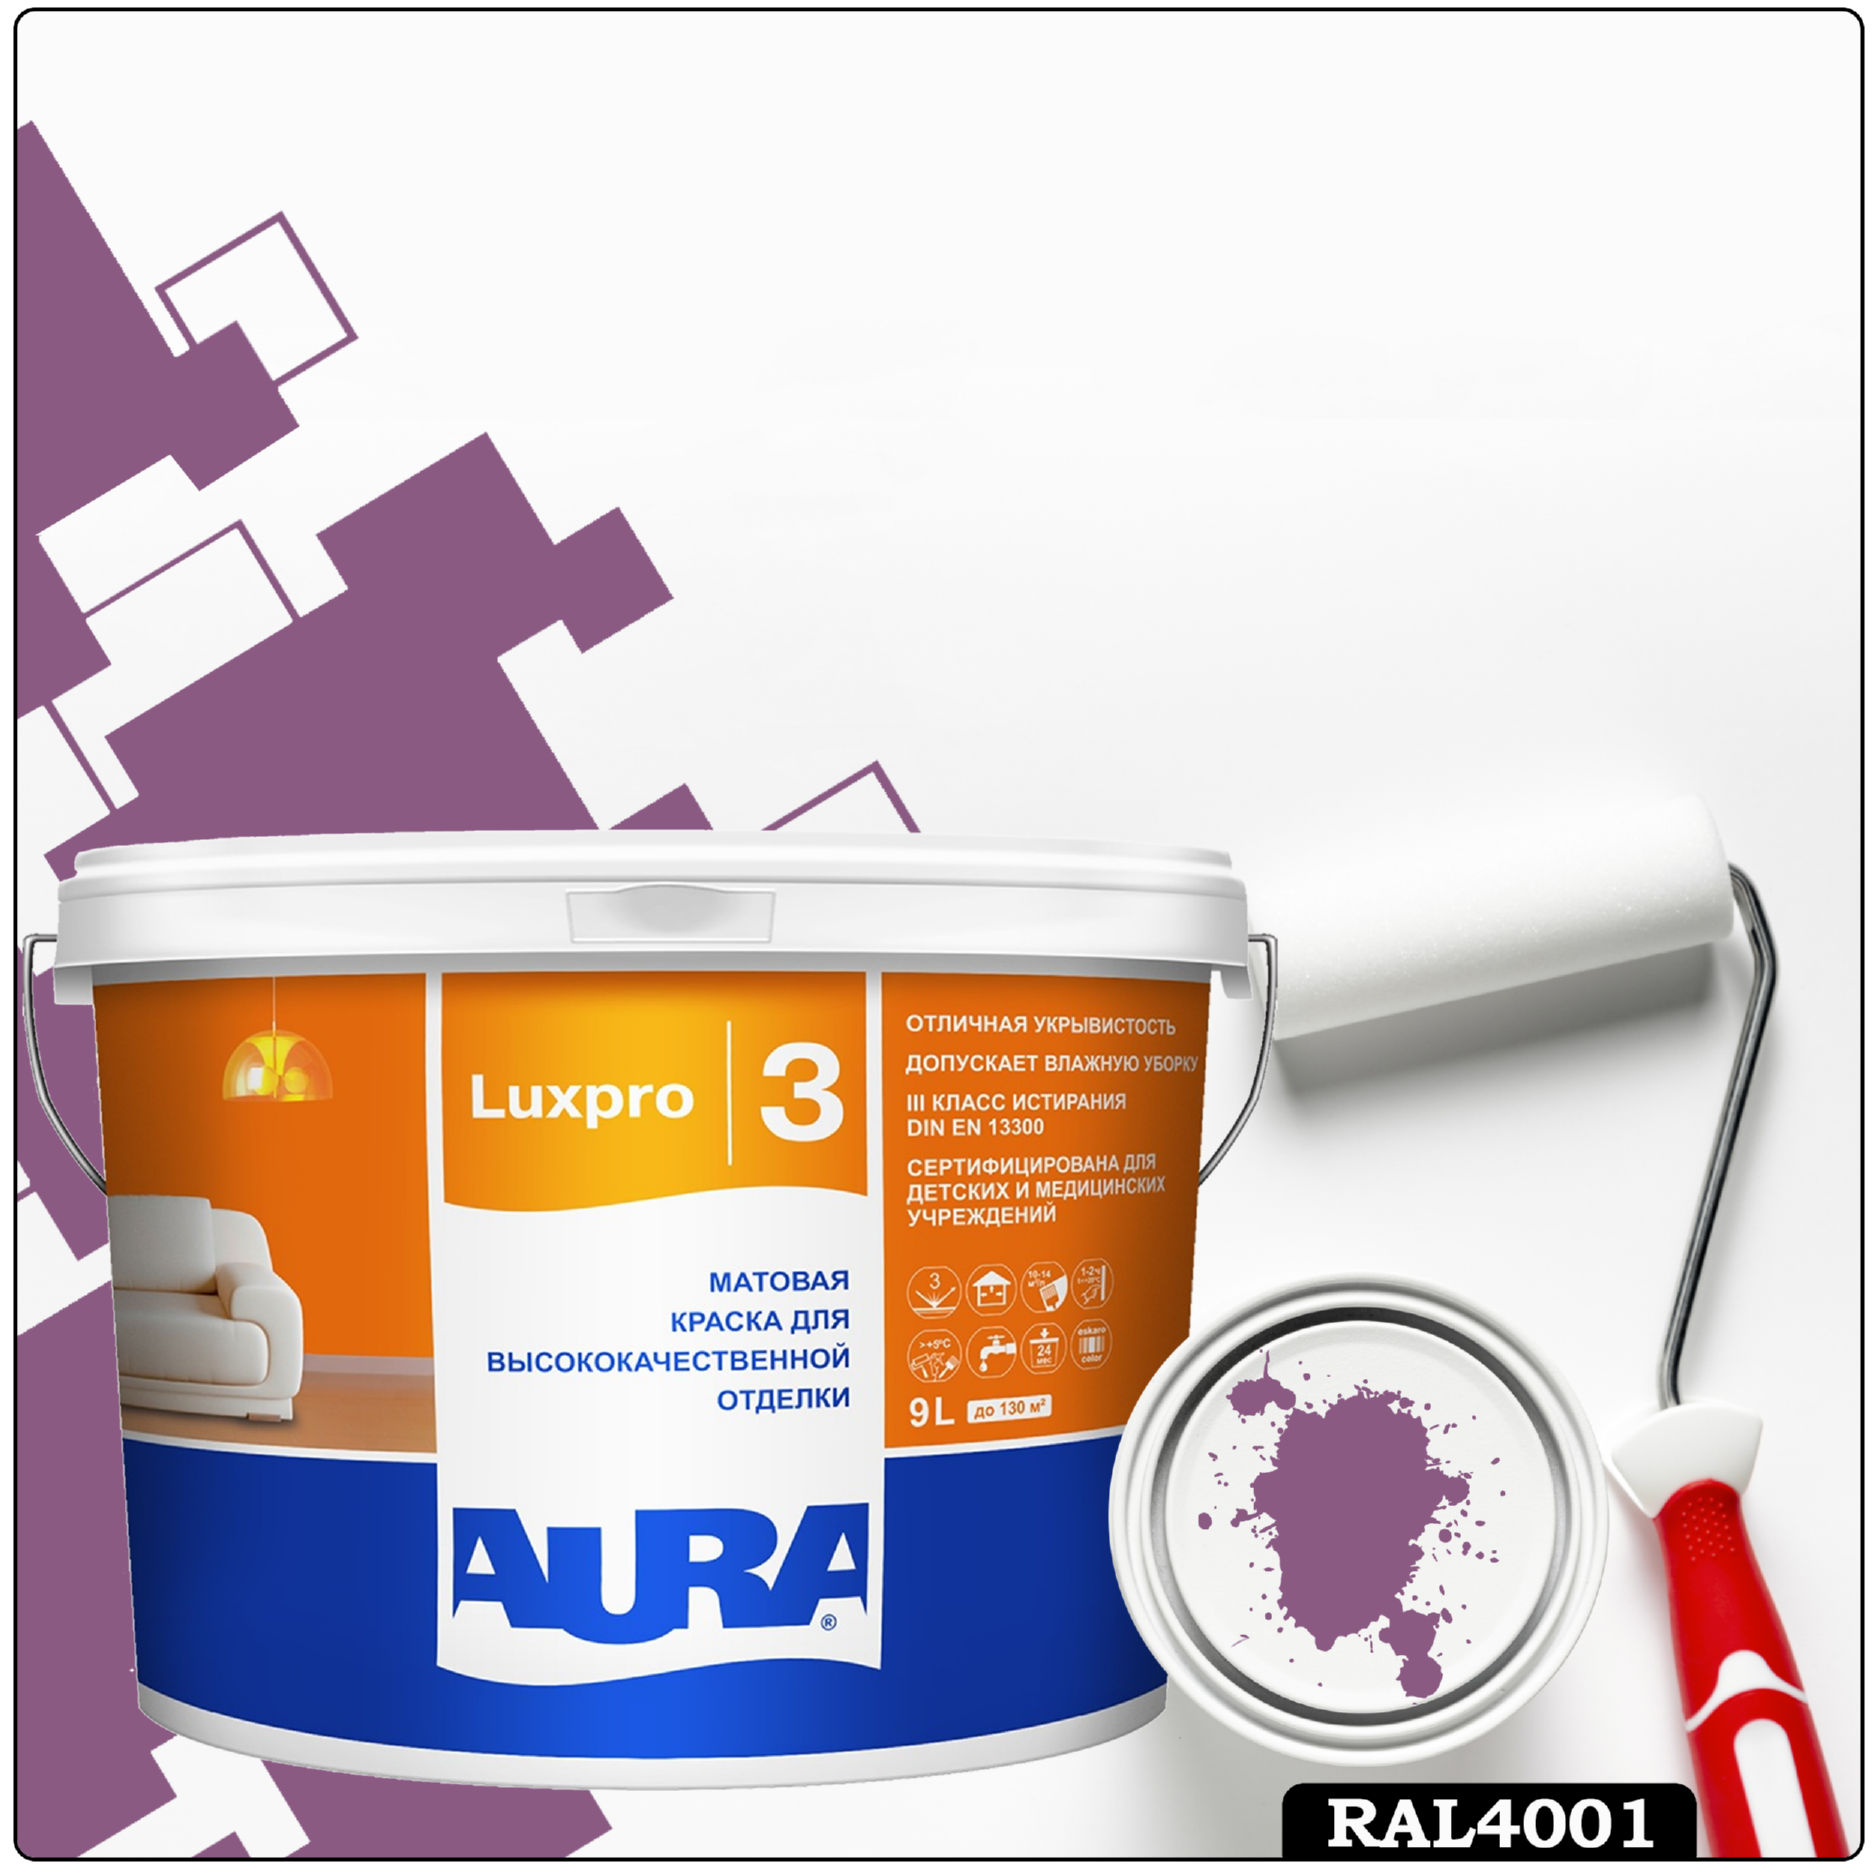 Фото 1 - Краска Aura LuxPRO 3, RAL 4001 Красно-сиреневый, латексная, шелково-матовая, интерьерная, 9л, Аура.